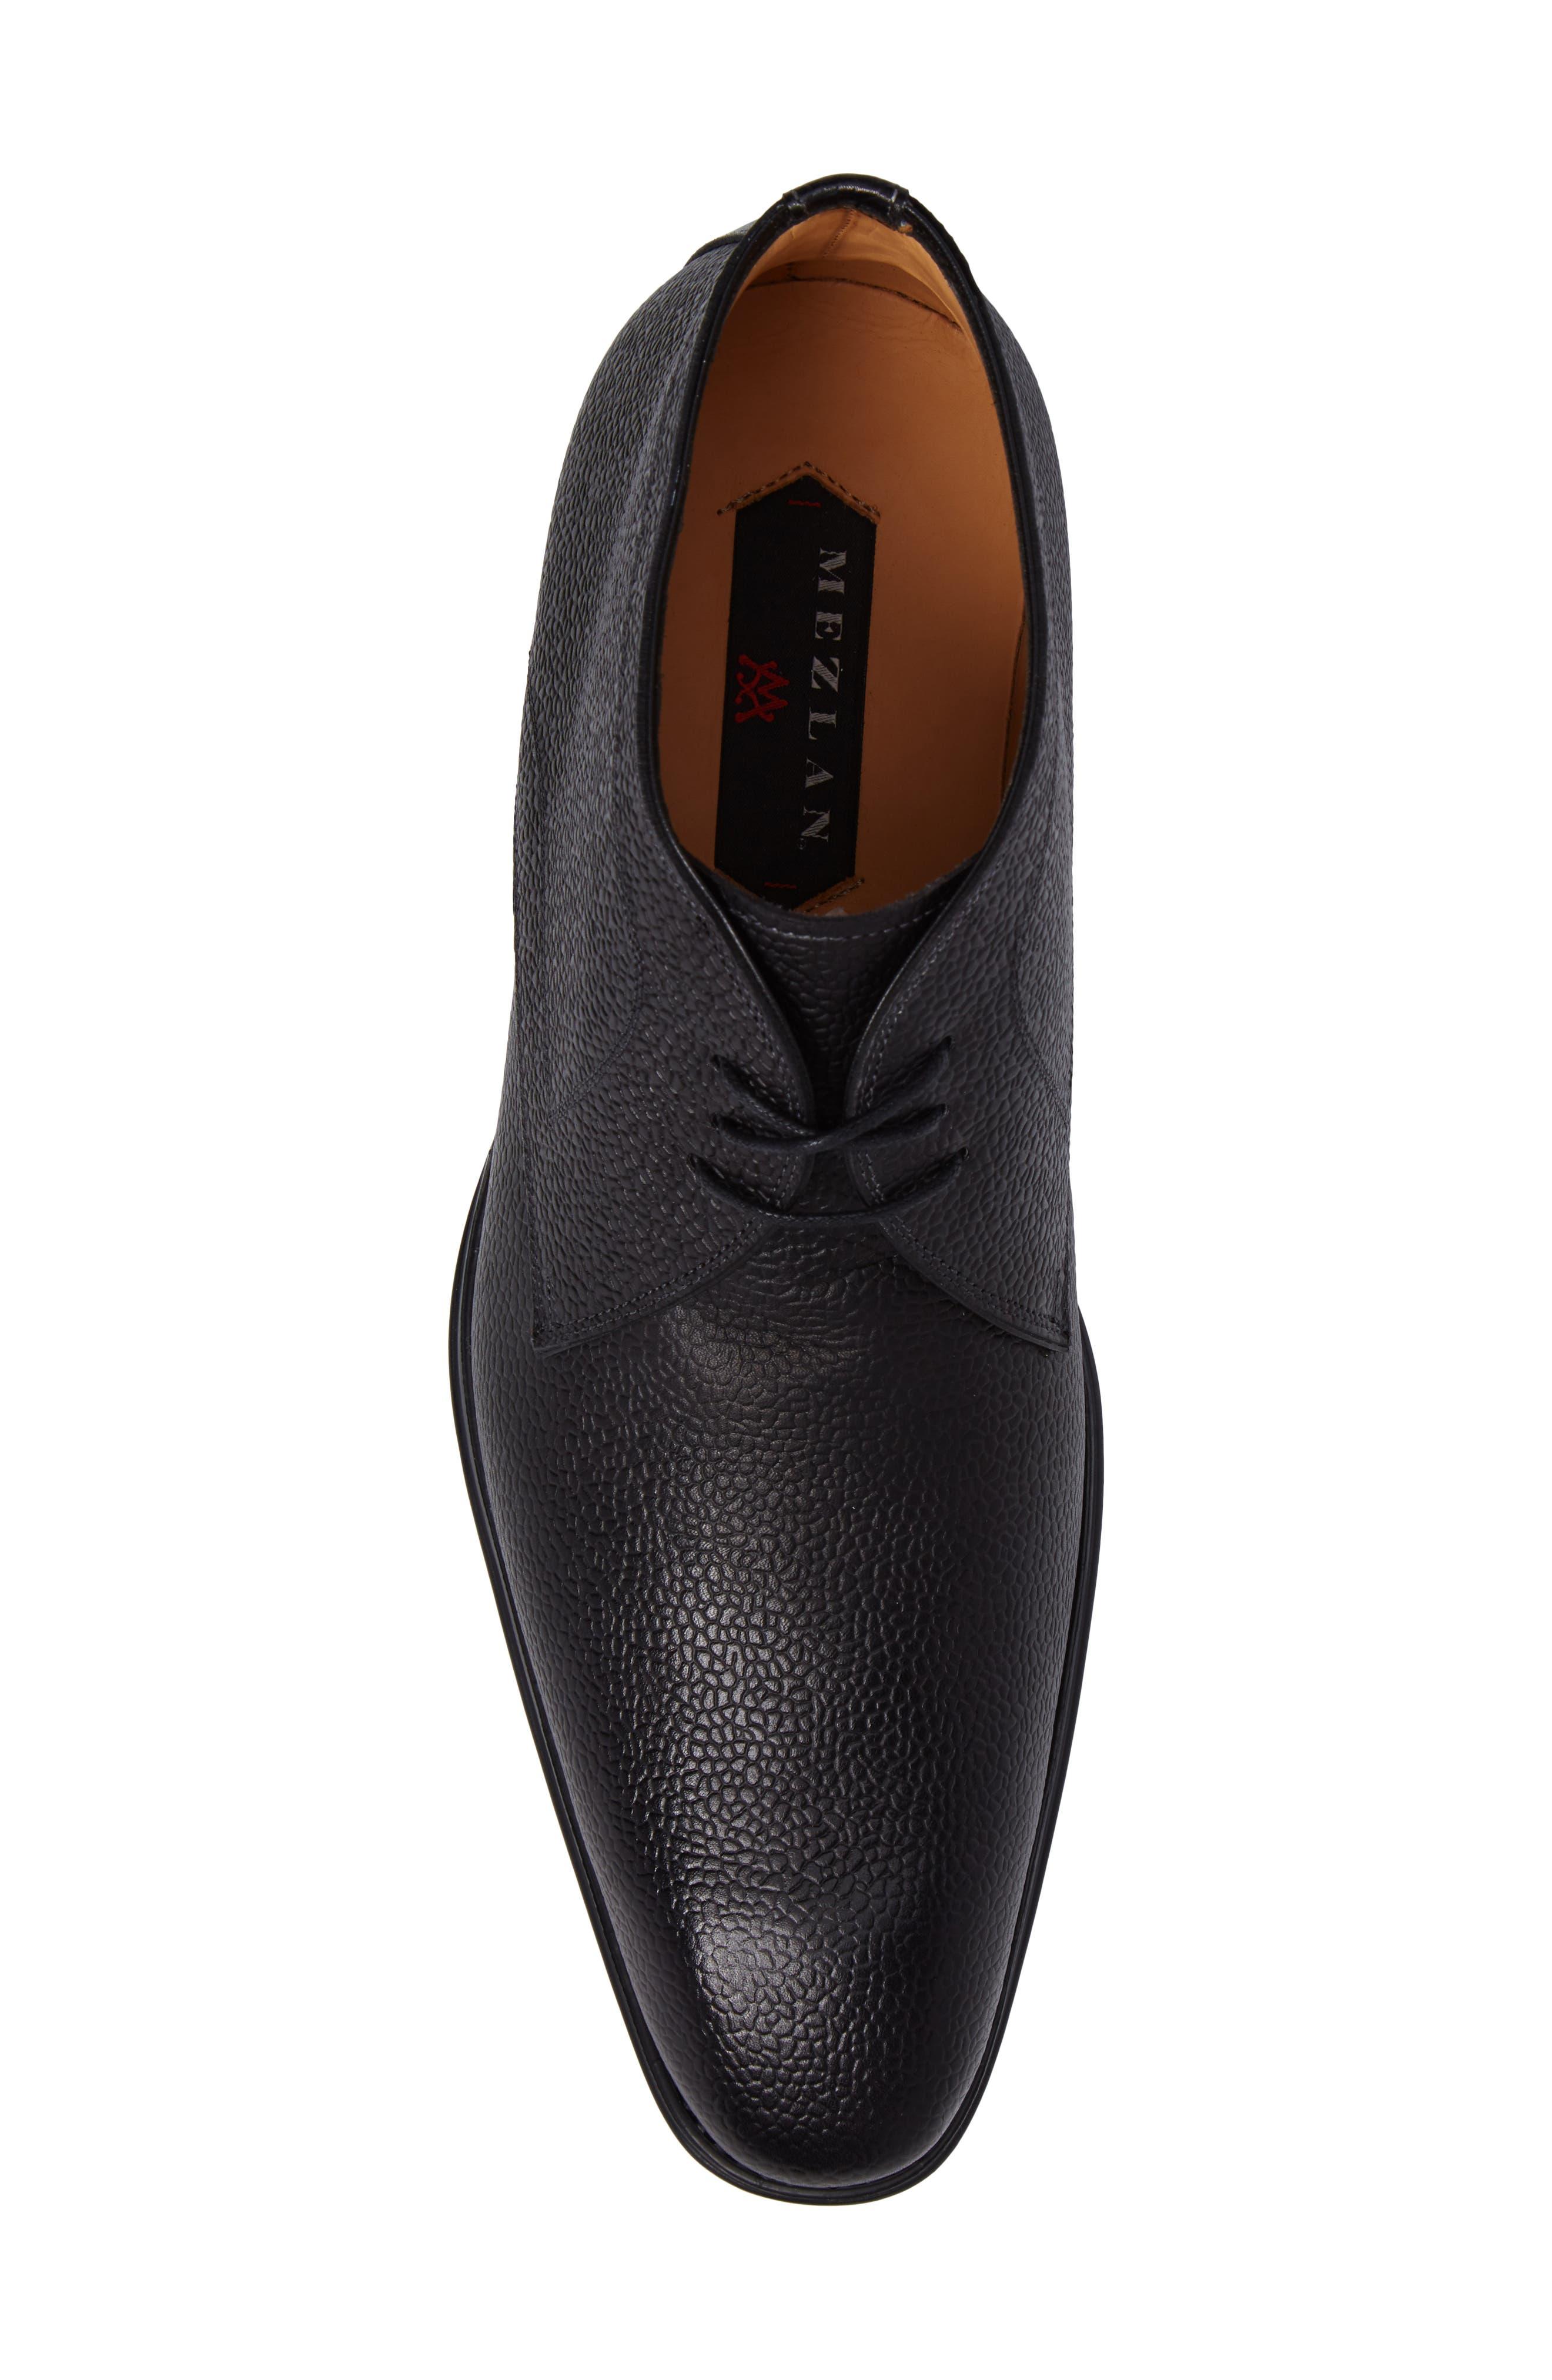 Cabra Plain Toe Derby,                             Alternate thumbnail 5, color,                             BLACK LEATHER